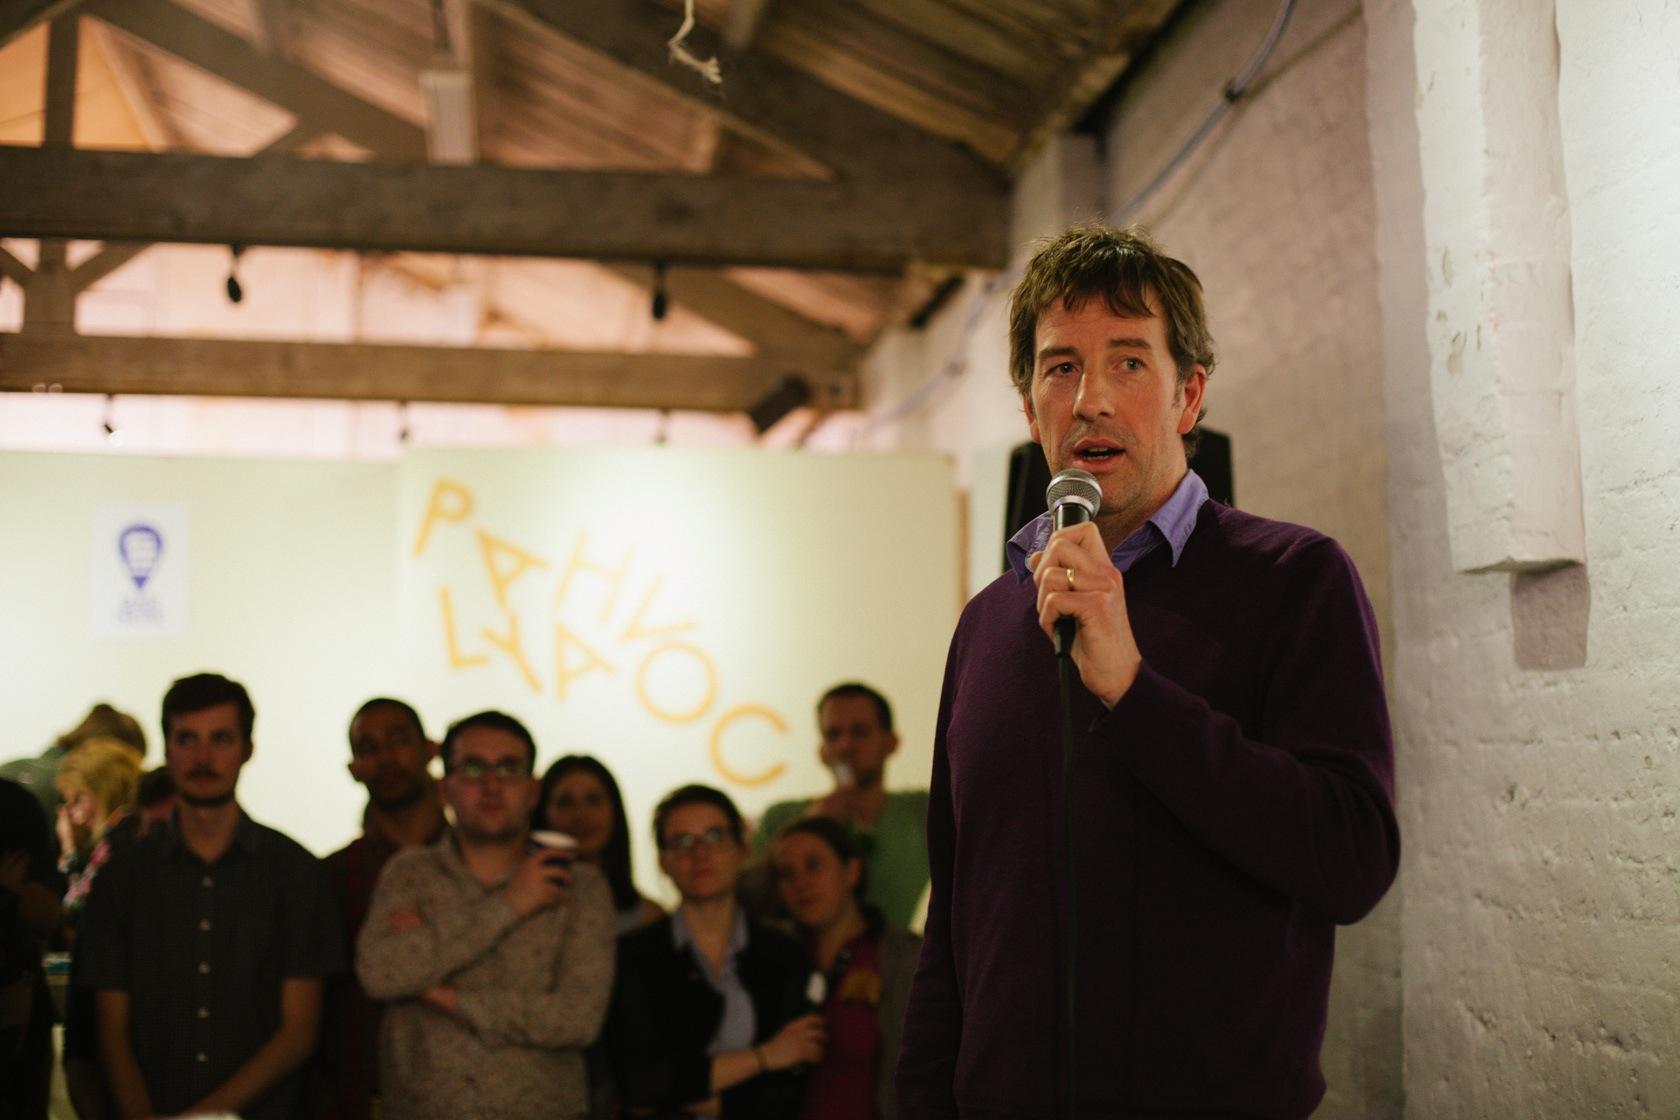 John-Paul Flintoff Speaking At The Year Here Event: CopyrightSam Boyd -@samboyd1